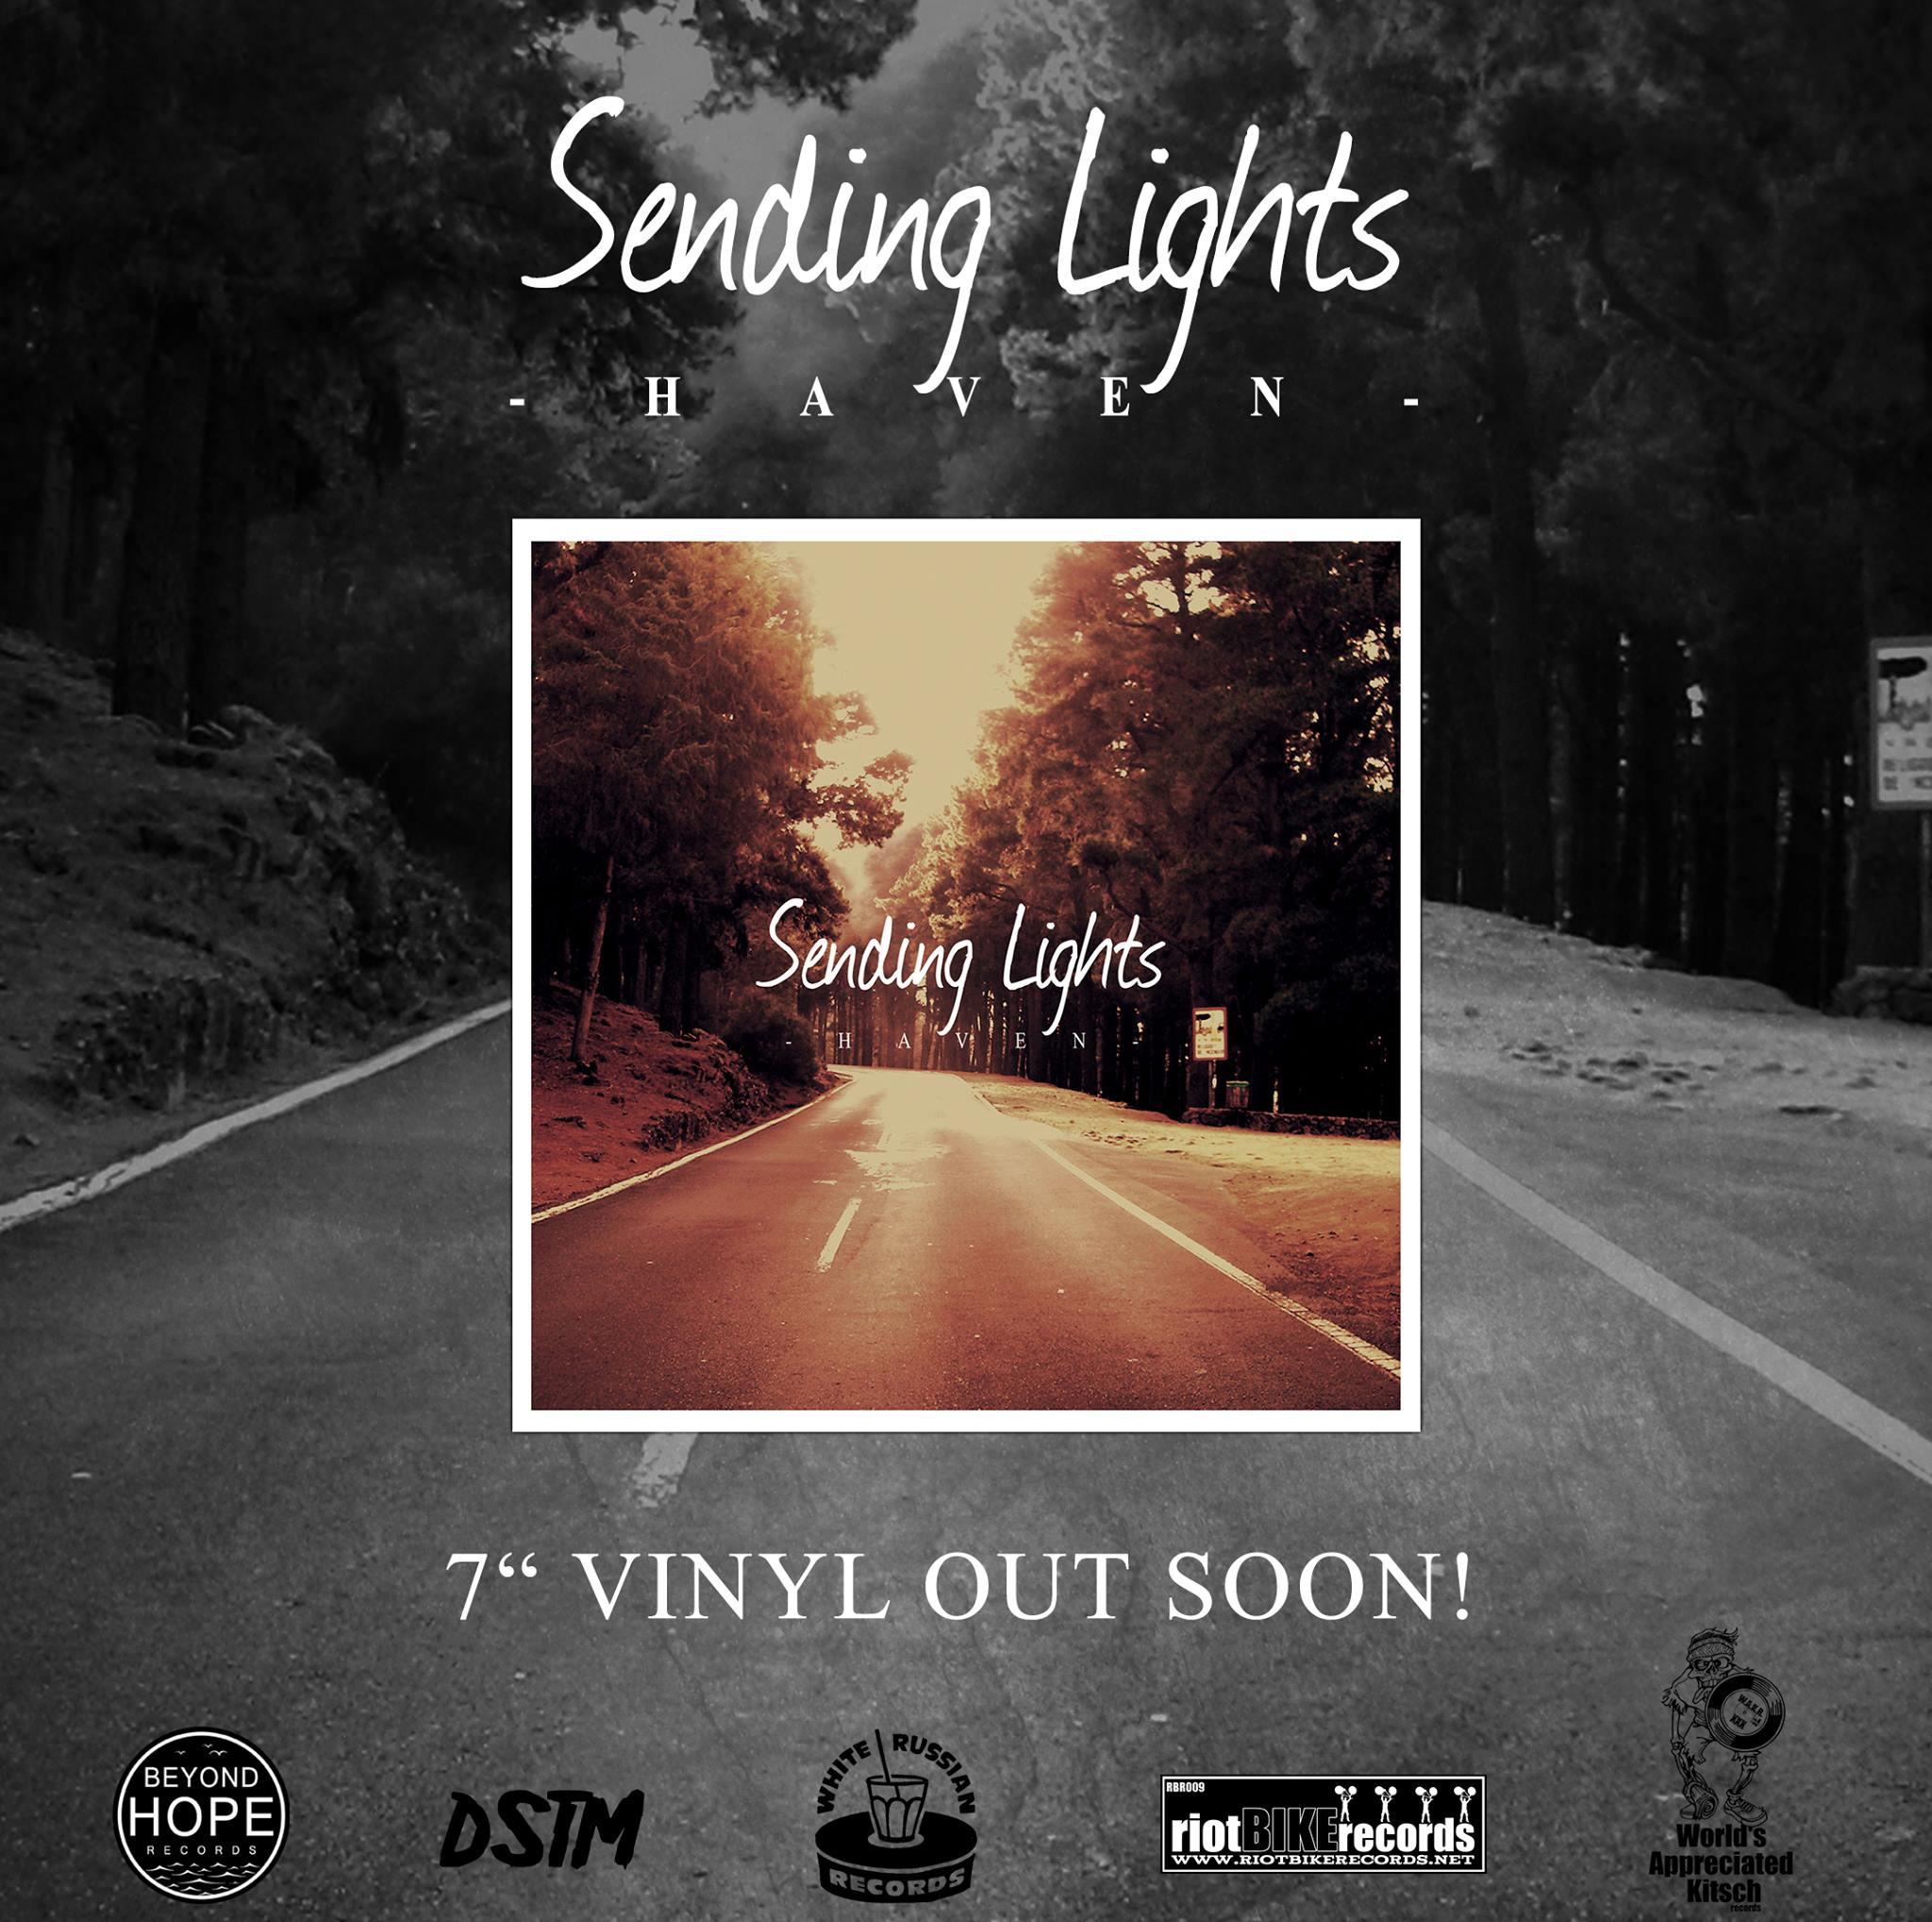 Sending Lights join White Russian Records